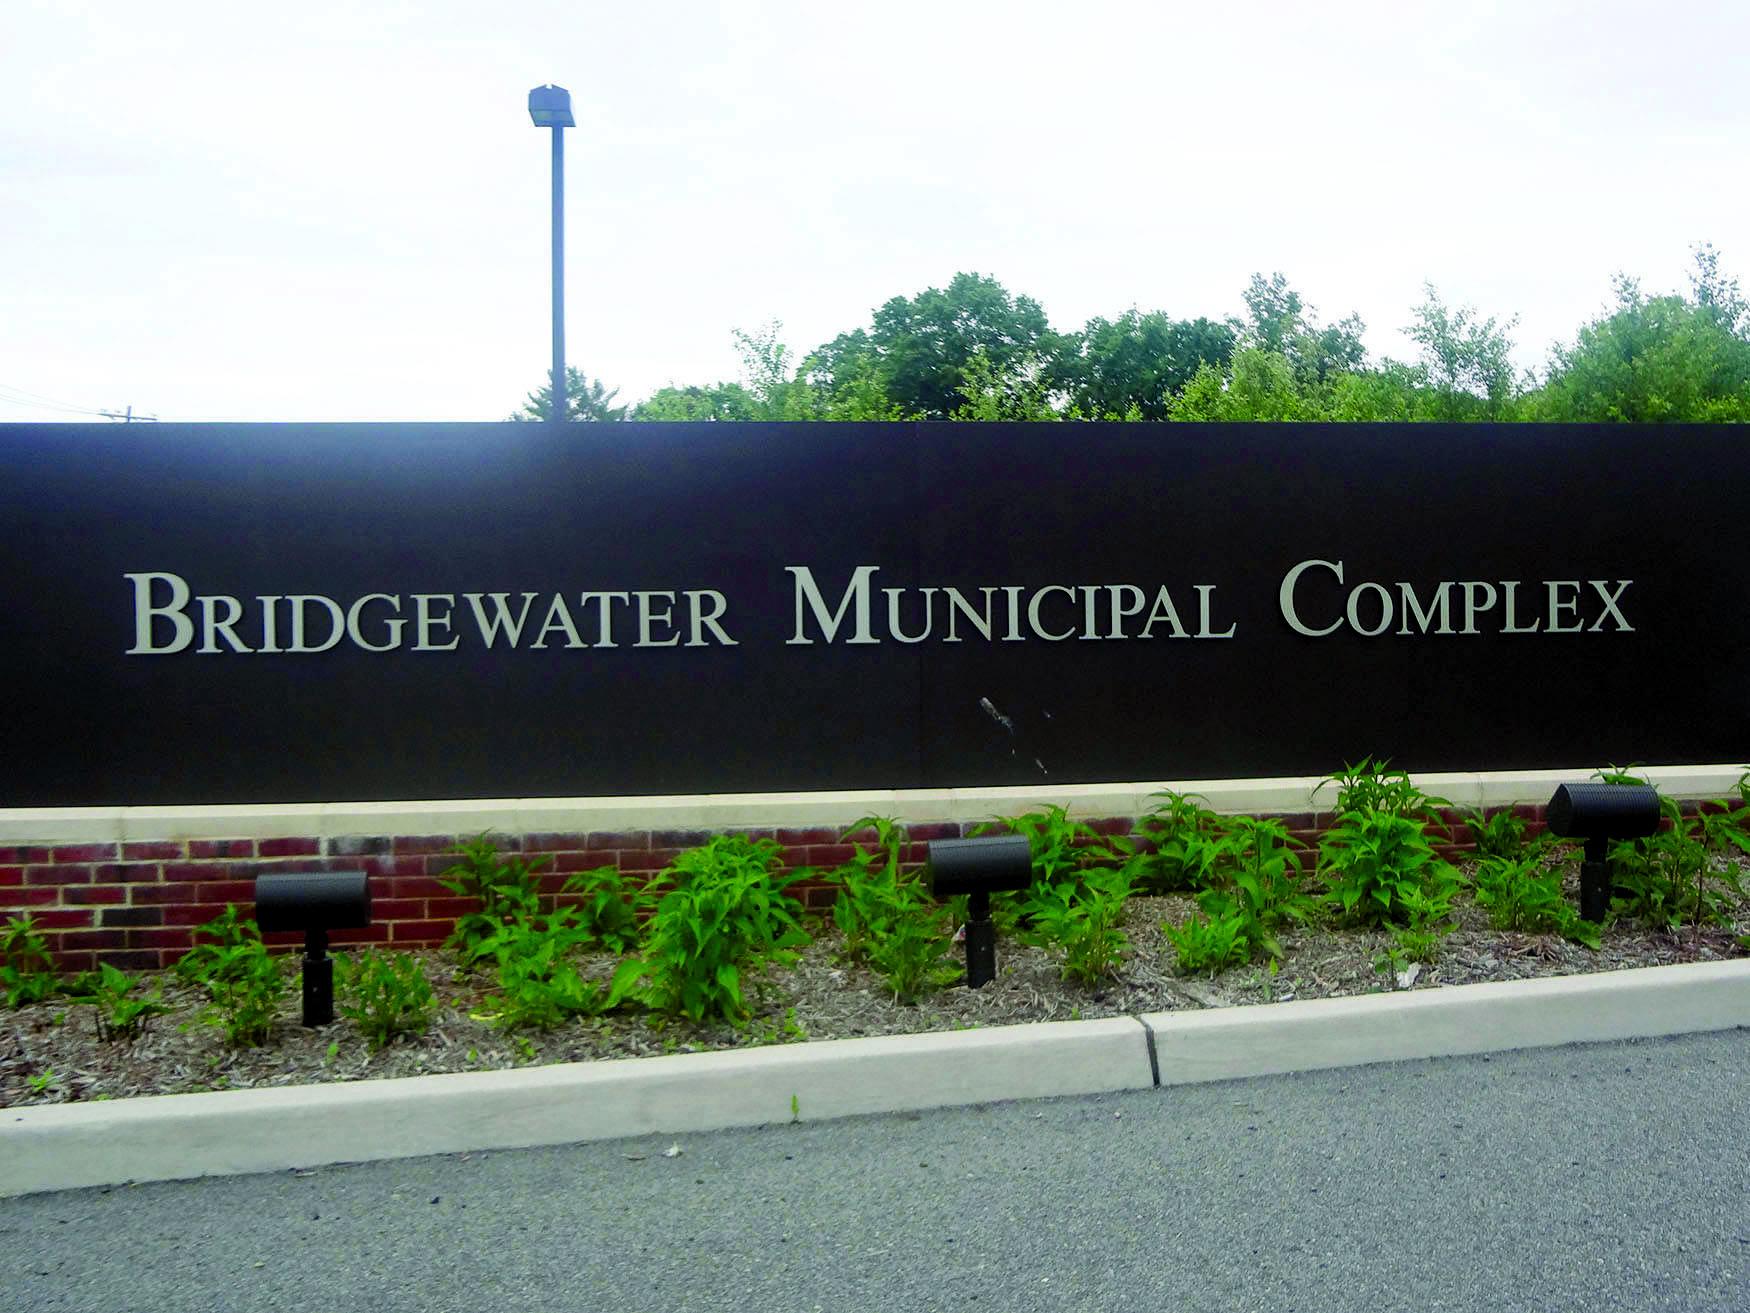 11bcf51cad3957b2dea2_Bridgewater_municipal.jpg